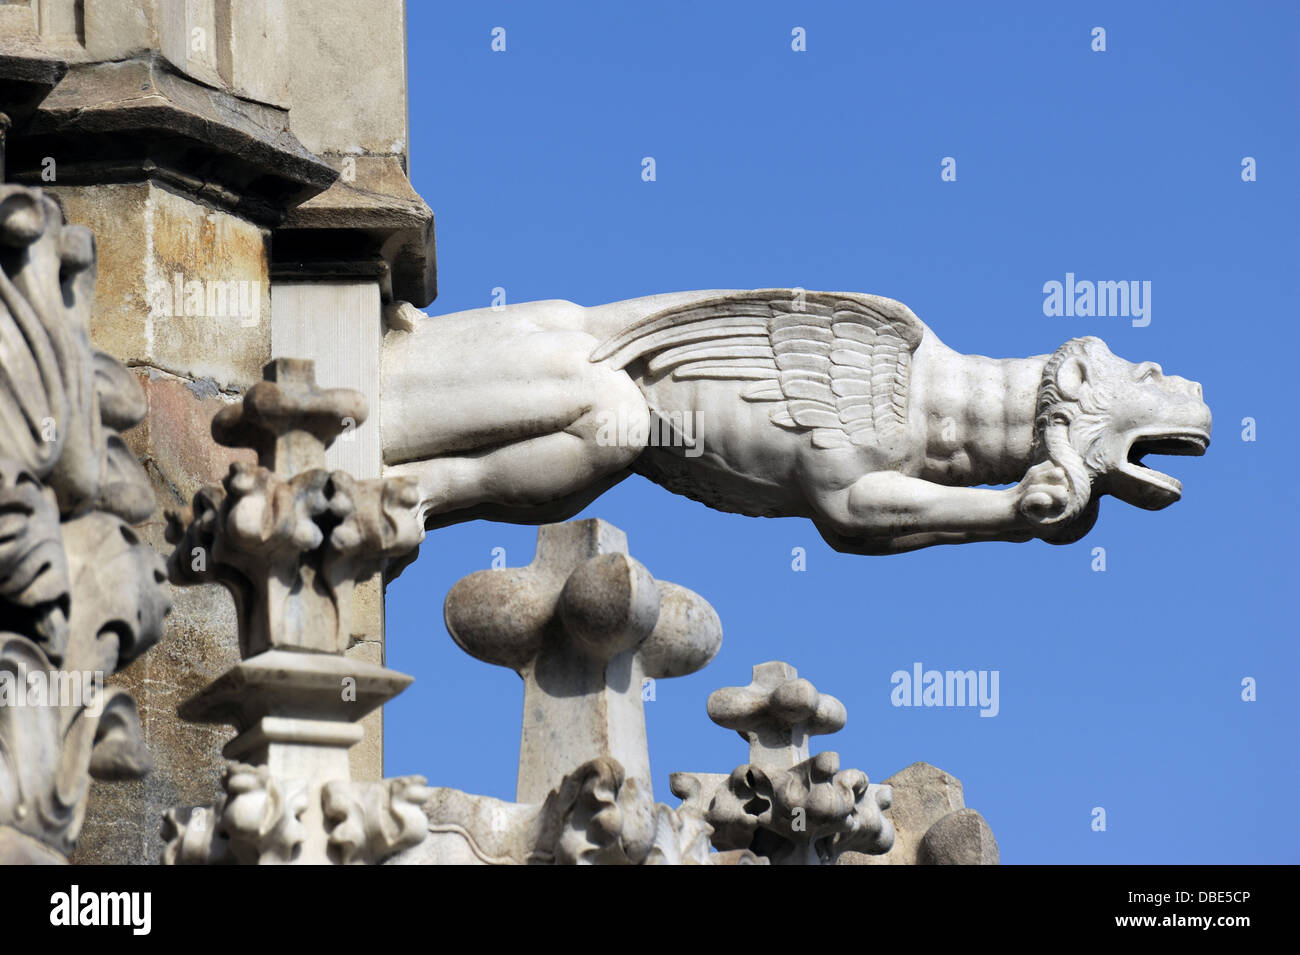 Italy. Milan. Cathedral. Gothic. 14th century. Exterior. Detail. Gargoyle. Fantastic animal. - Stock Image